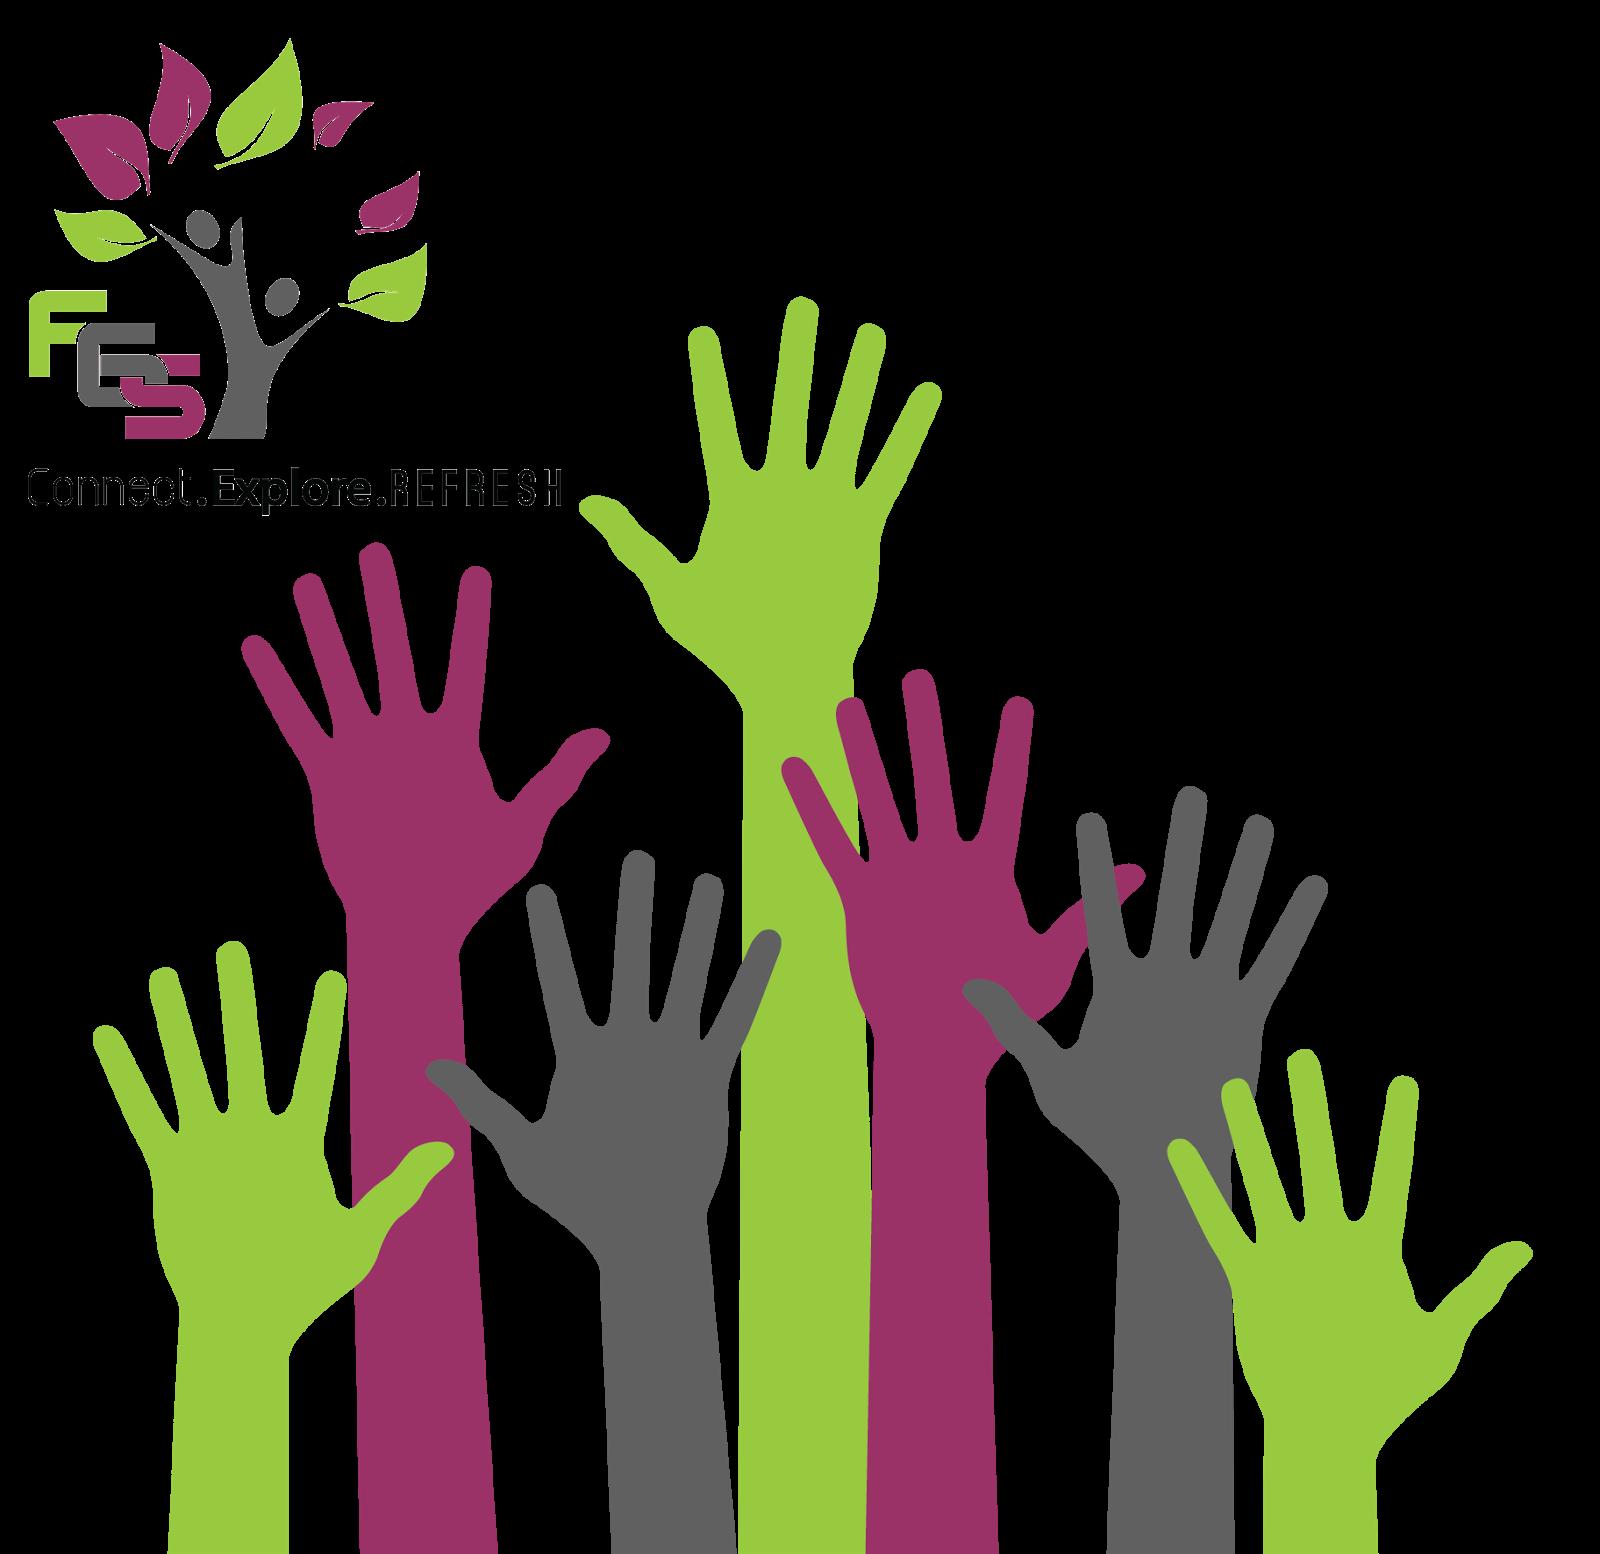 Fgs voice calling for. Volunteering clipart volunteer hand